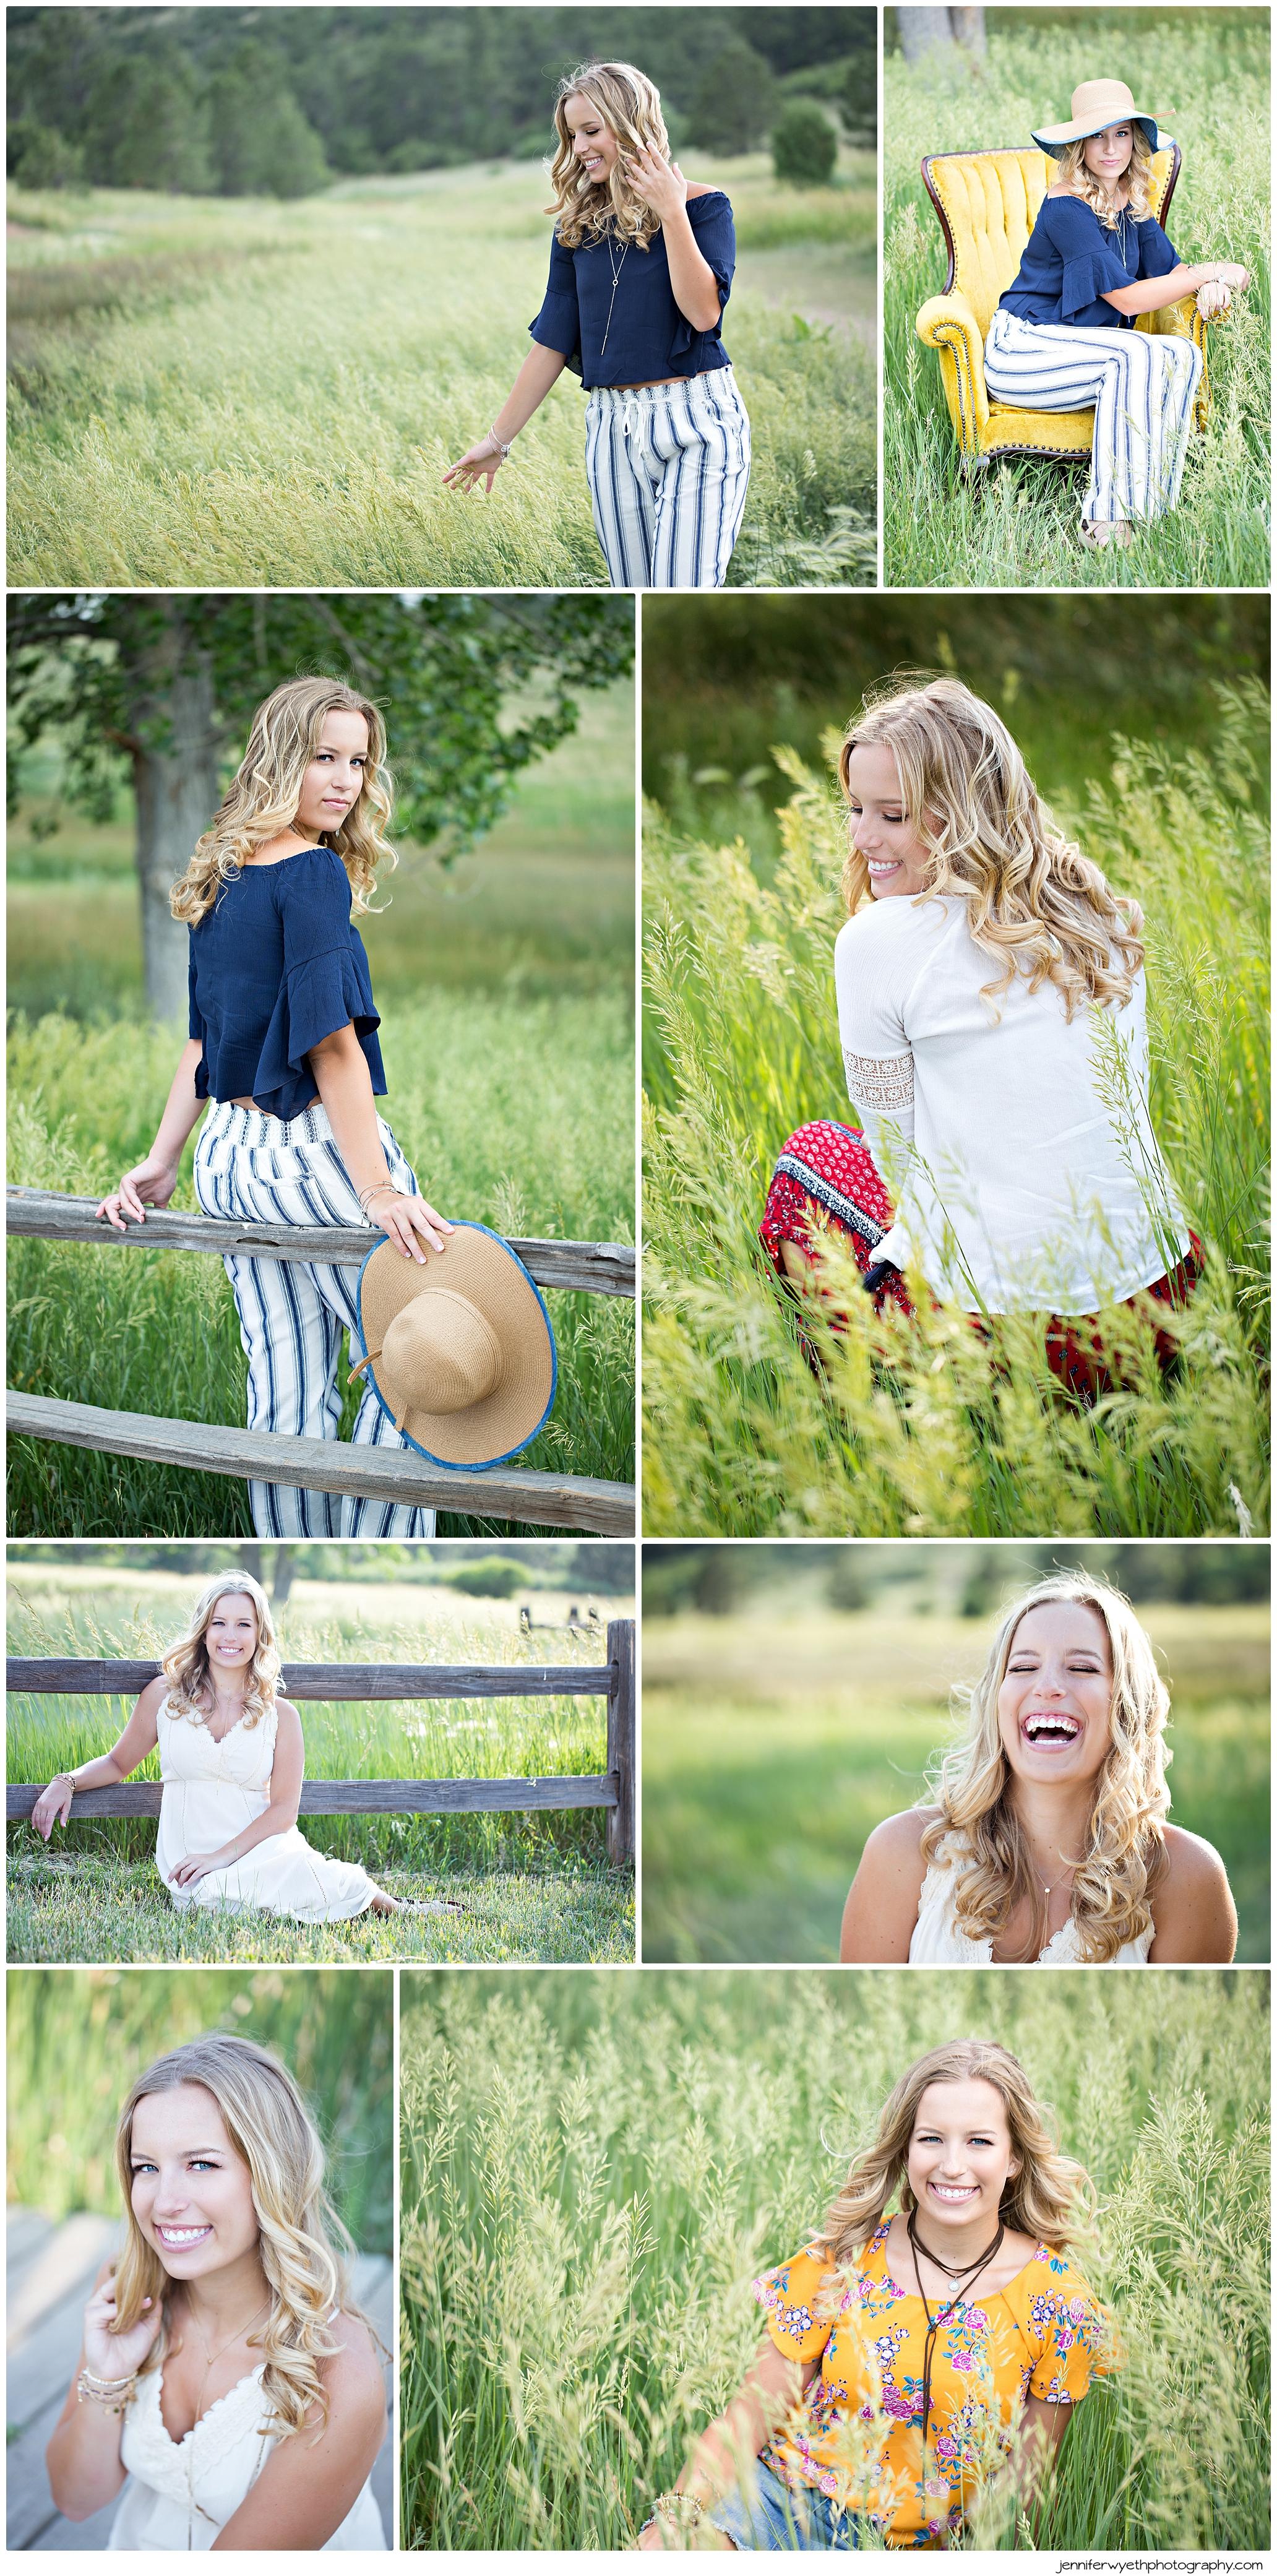 Jennifer-Wyeth-photography-senior-pictures-colorado-springs-photographer_0223.jpg